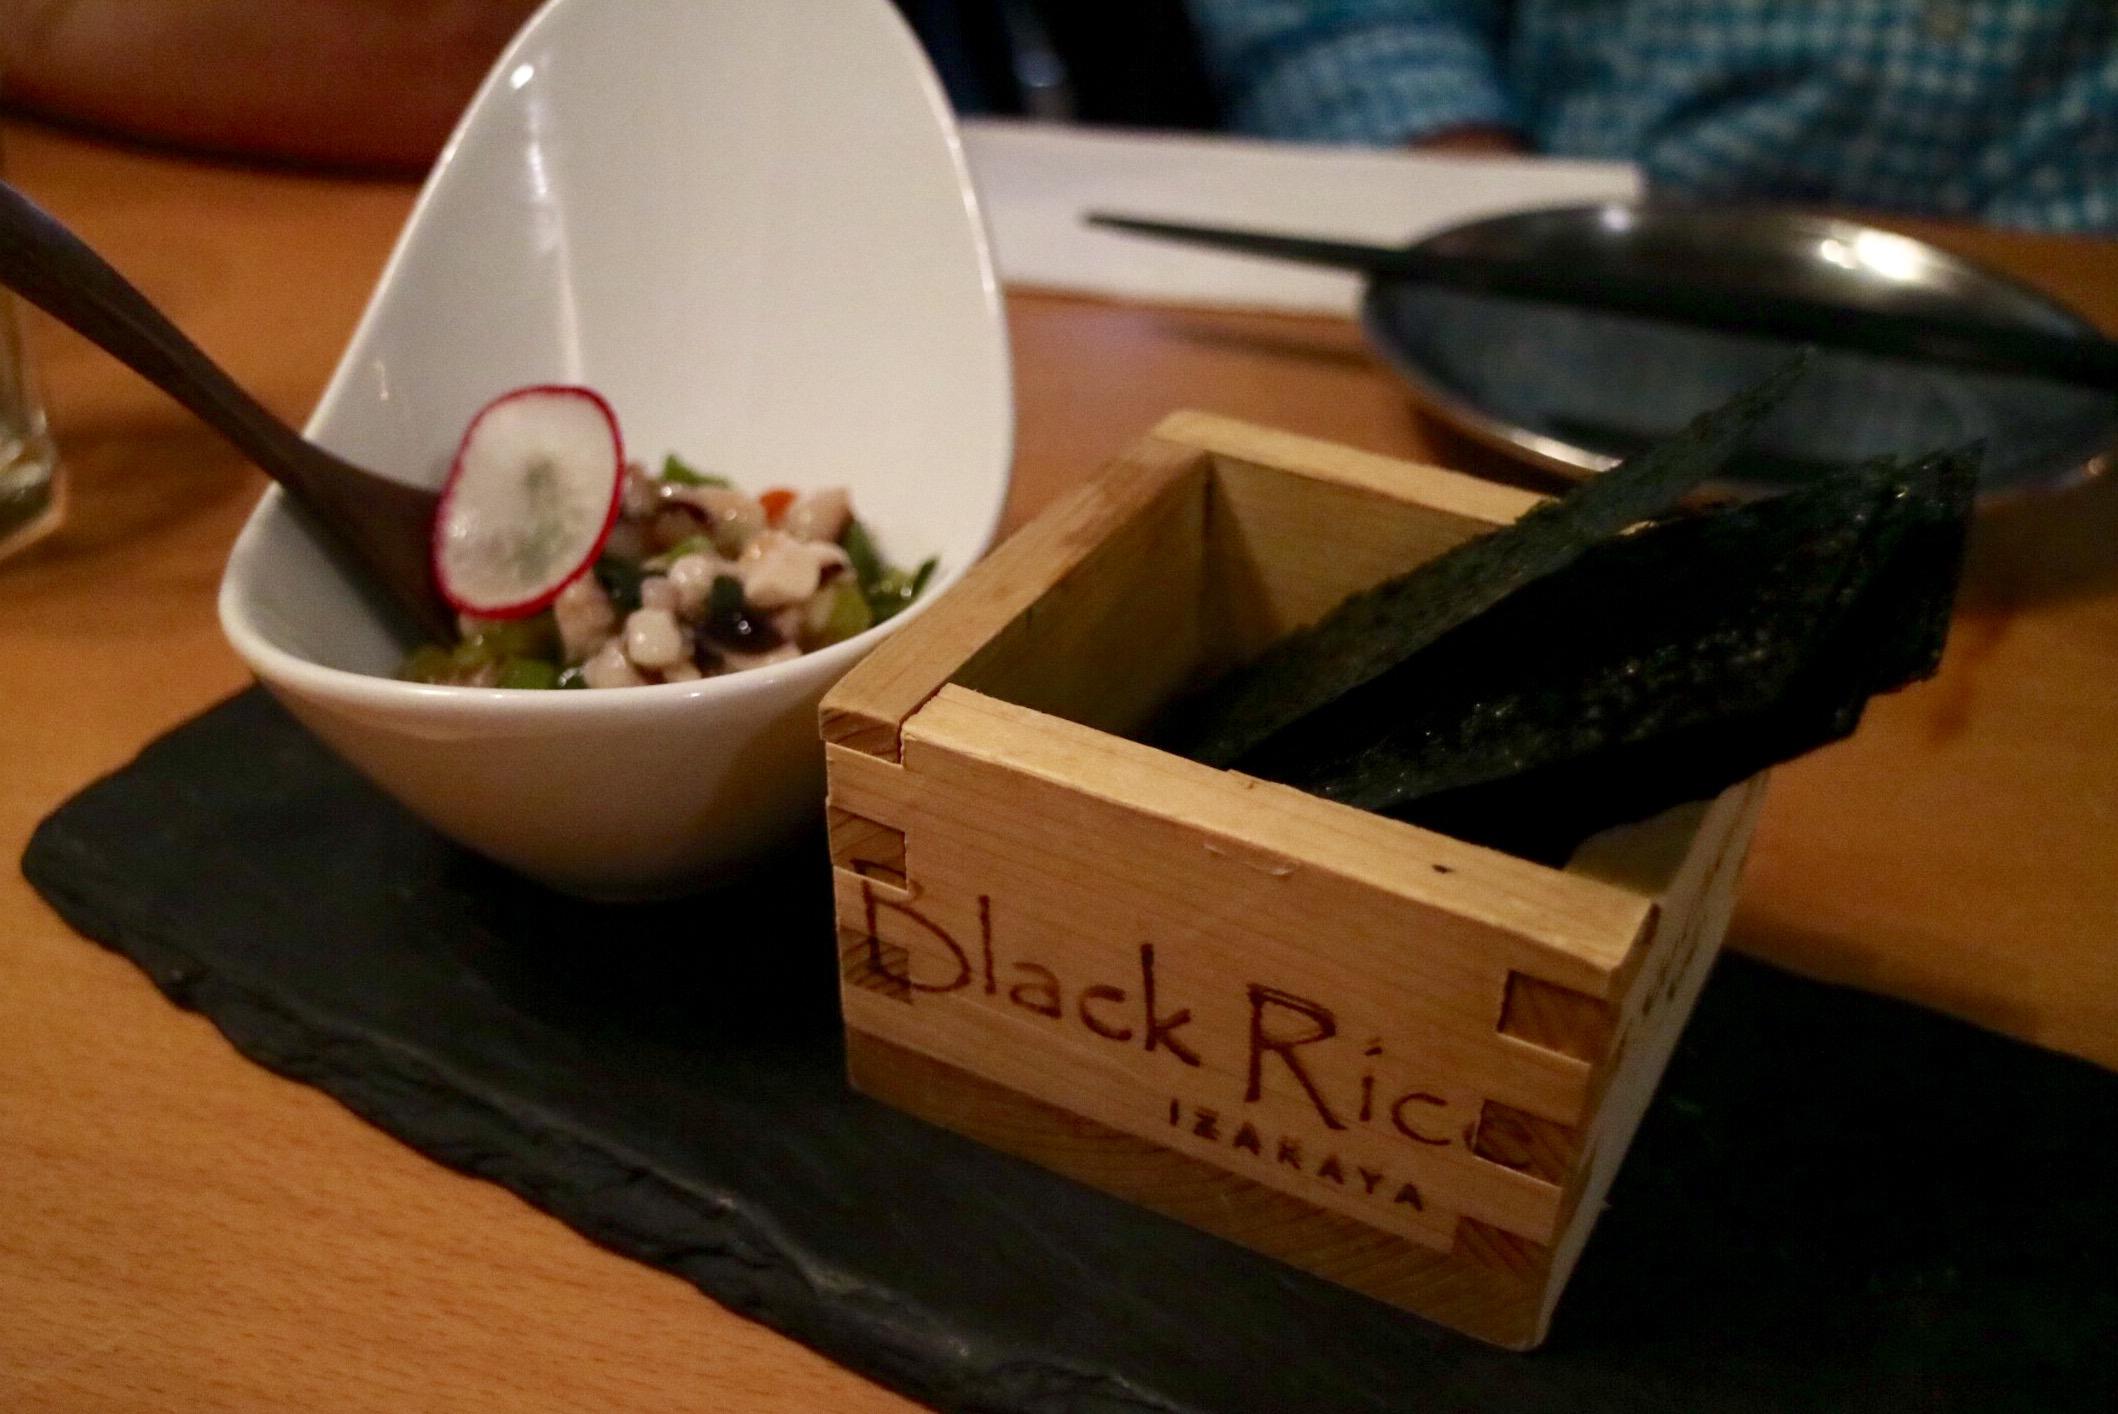 tako wasa @ black rice